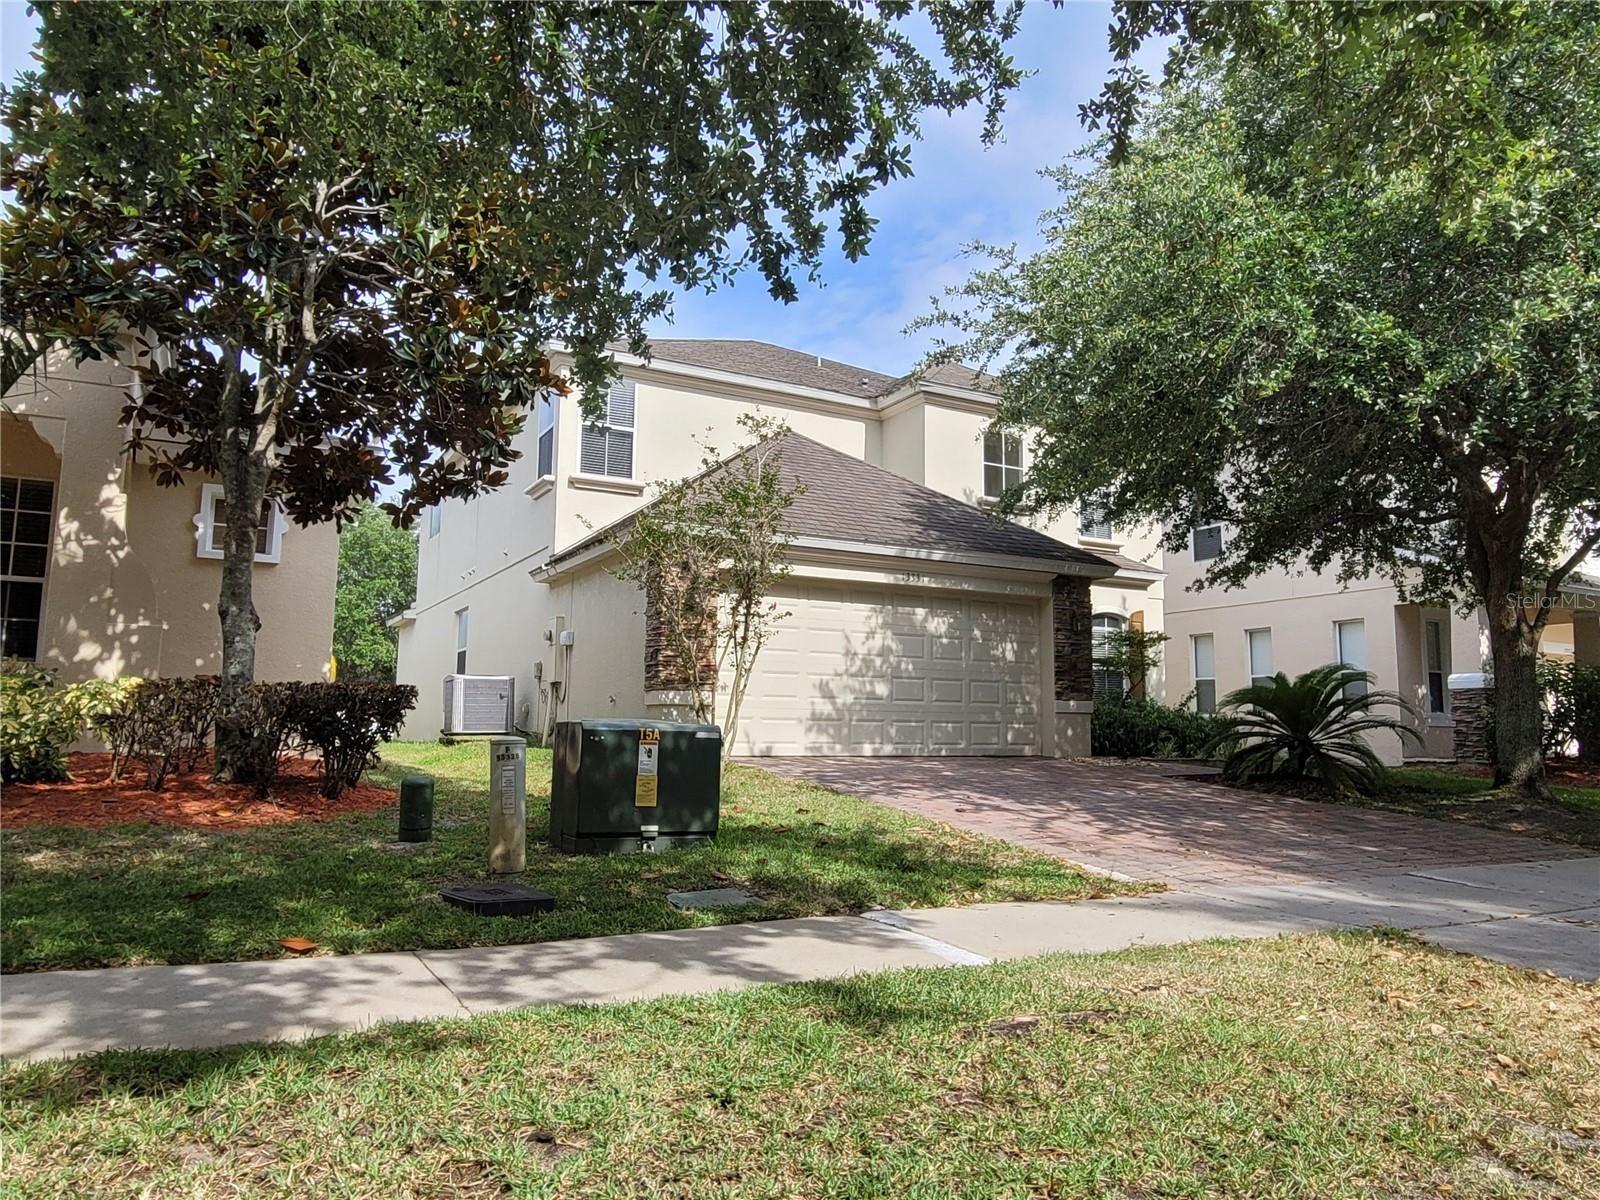 13331 HATHERTON CIRCLE, Orlando, FL 32832 - MLS#: O5942559